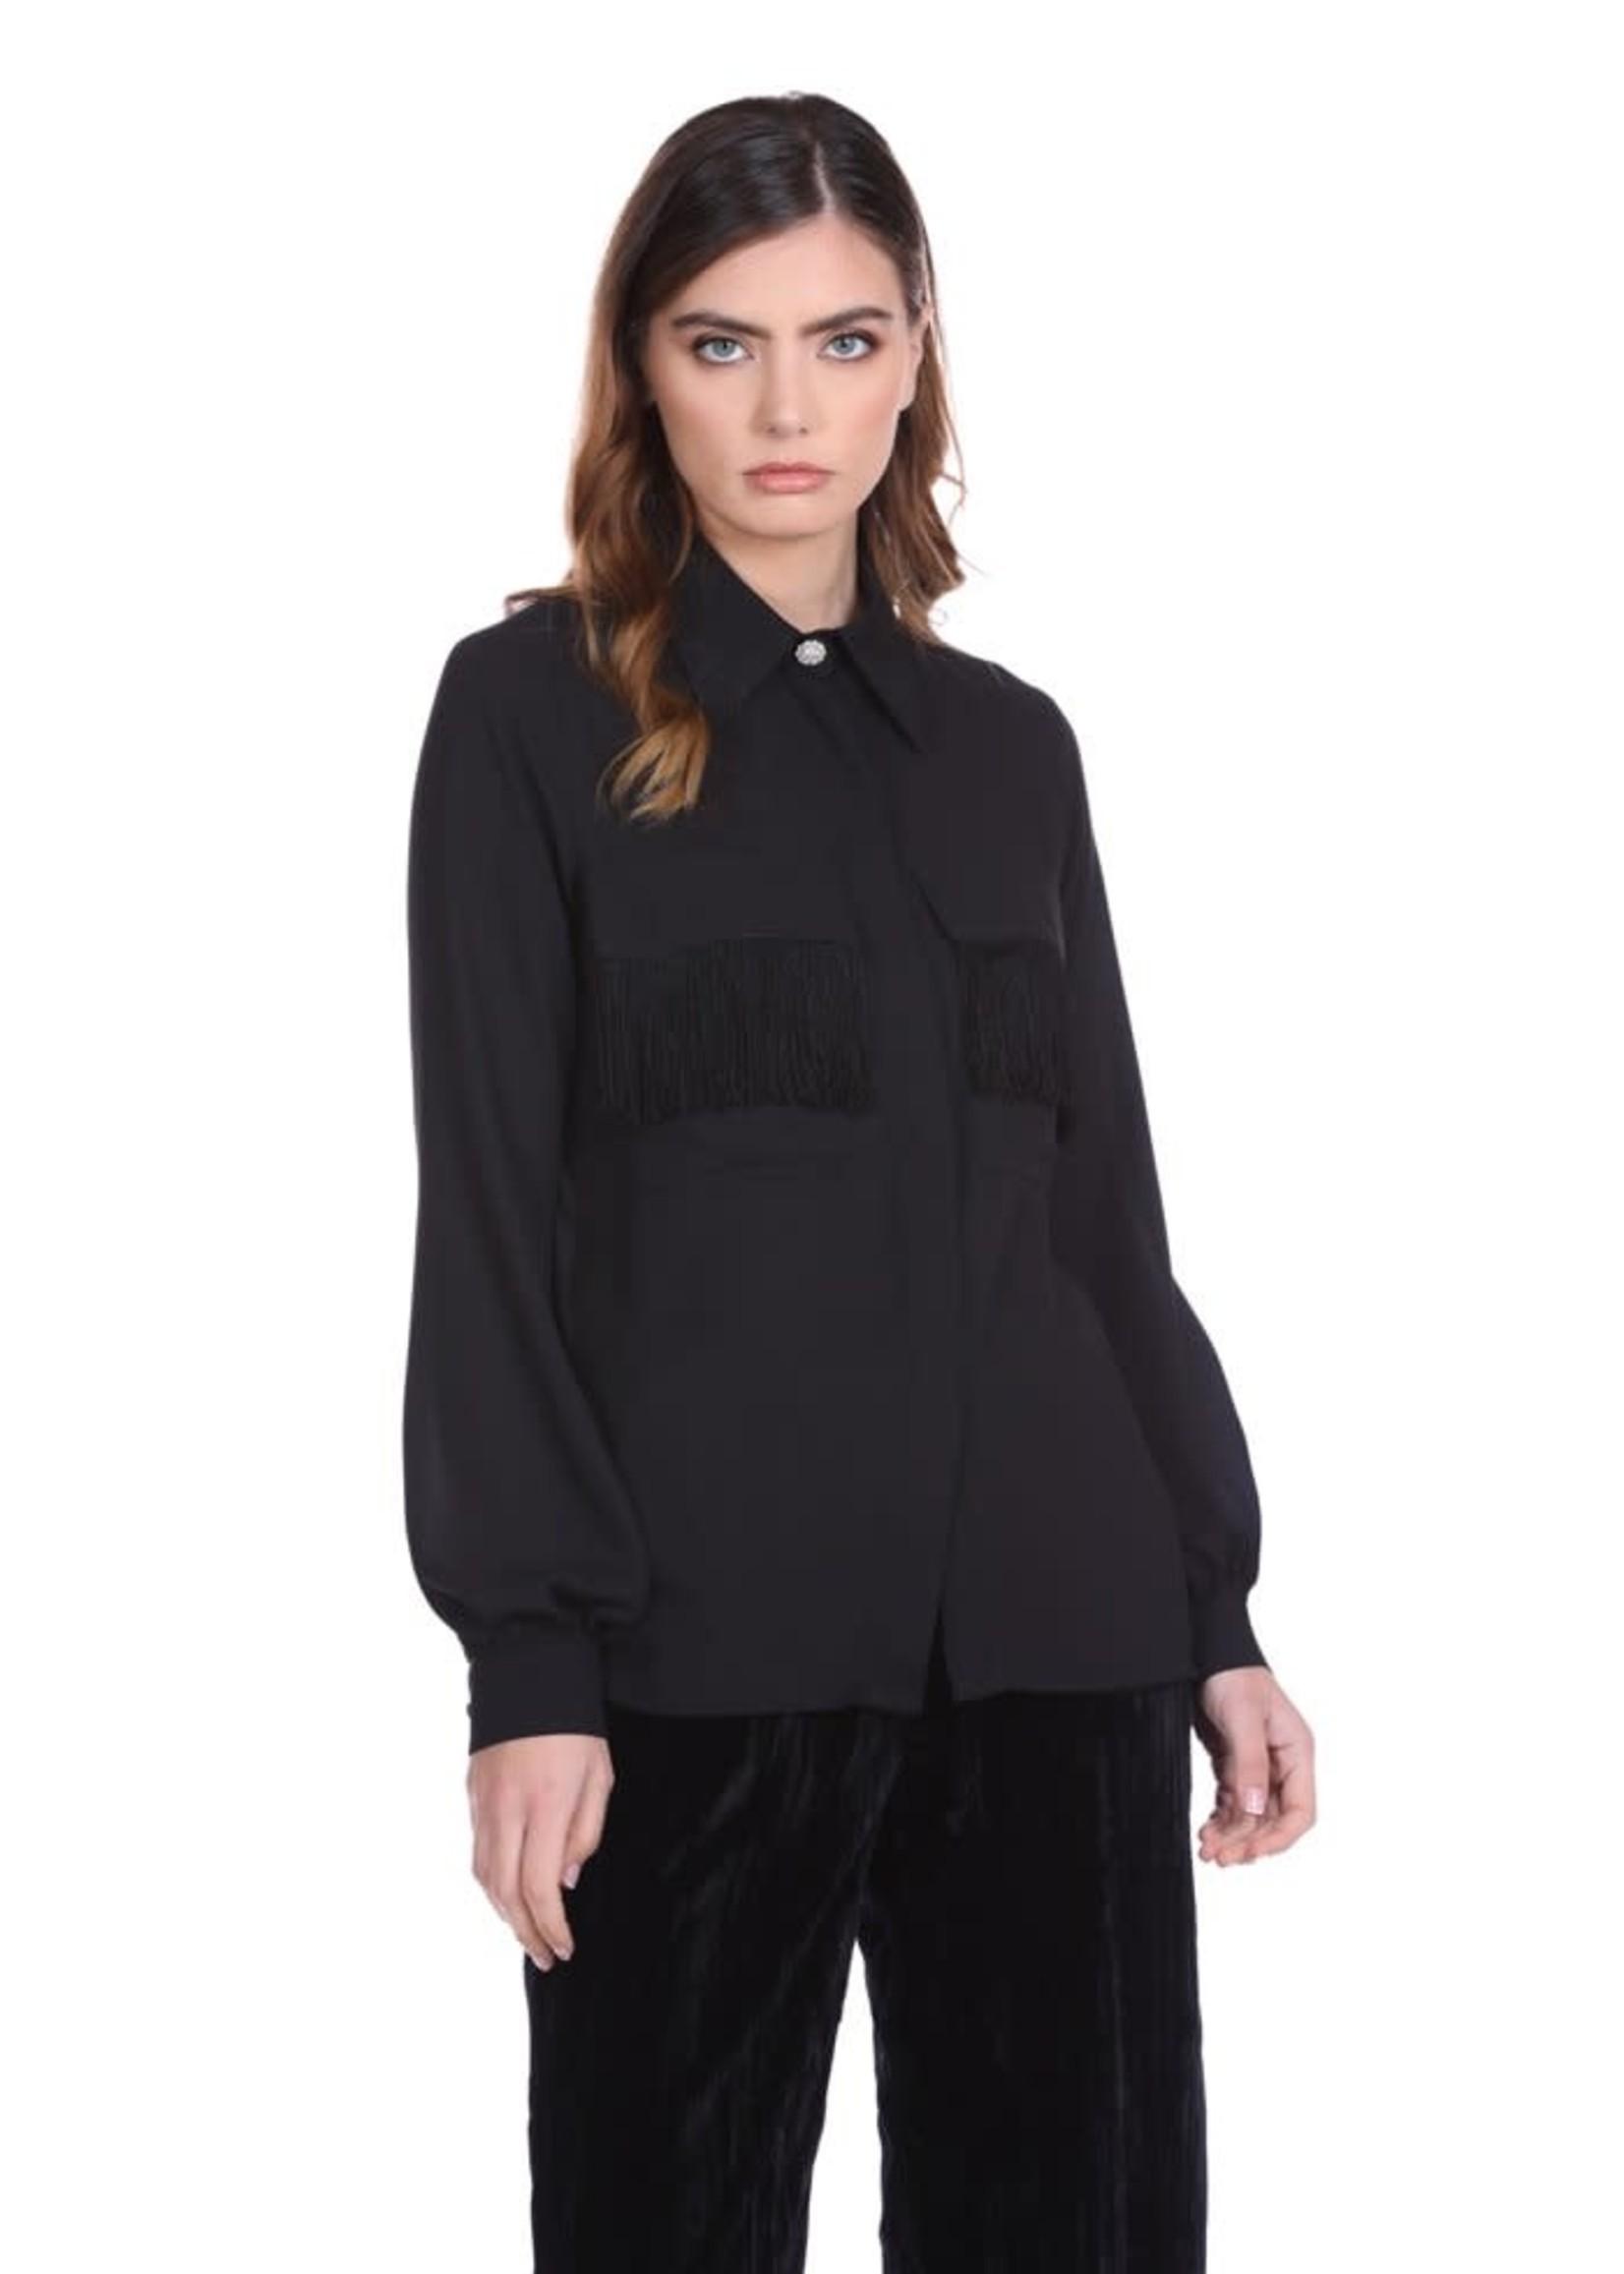 Relish DENCROS overhemd met lange mouwen en juweelknoop plus zakken met klep plus franjes